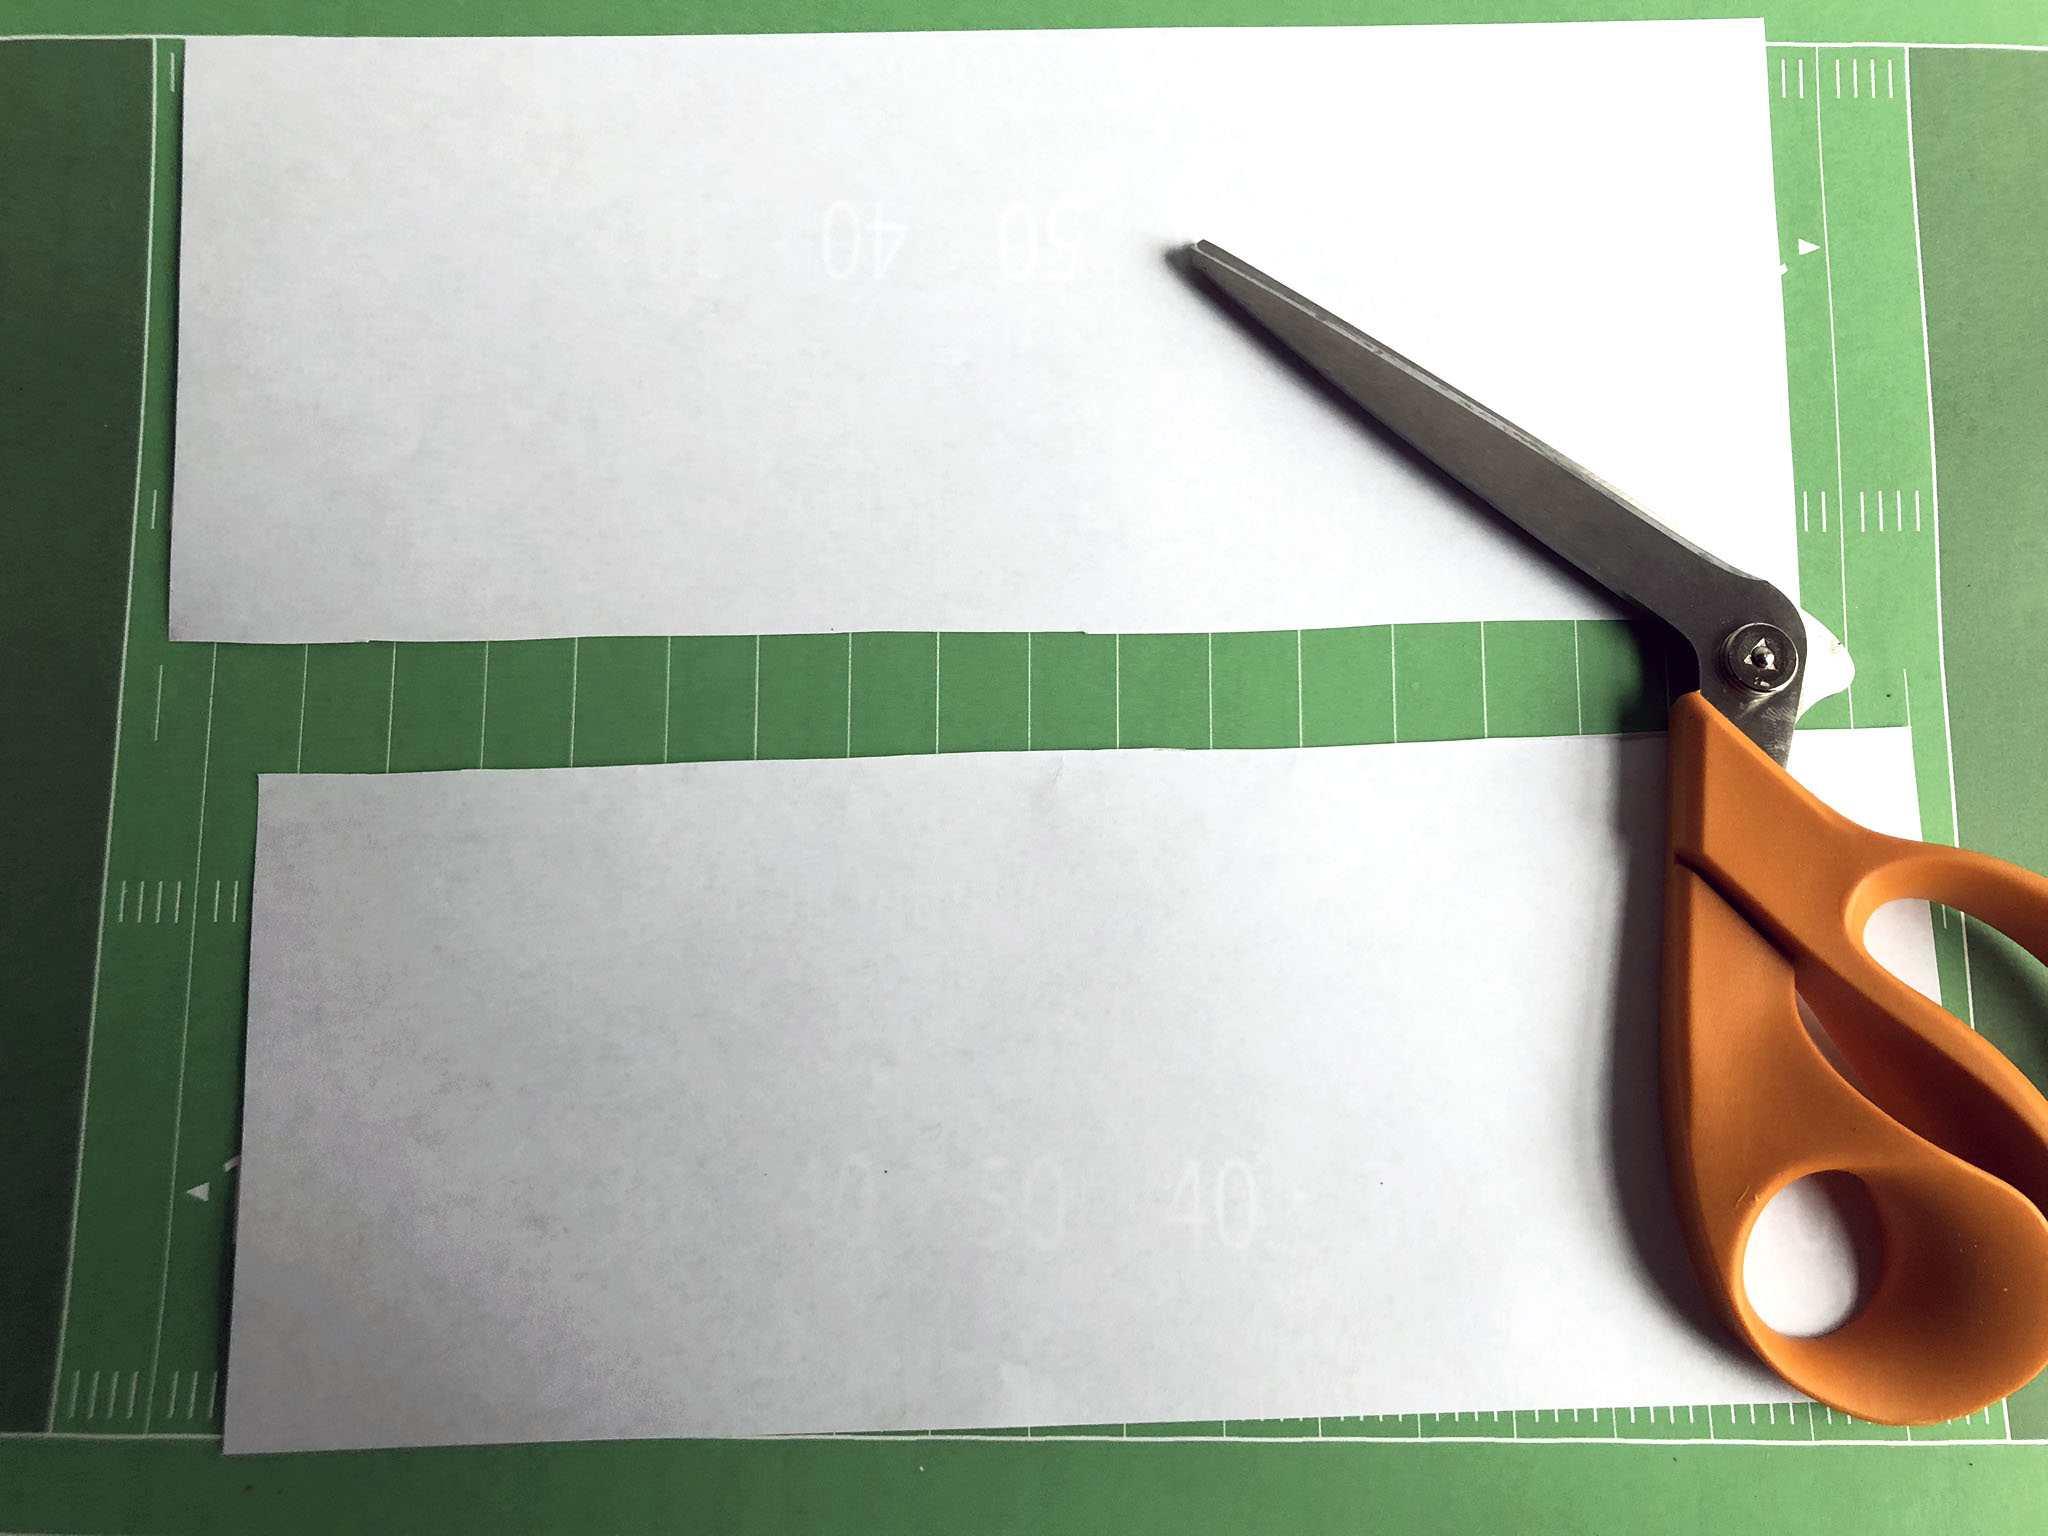 sheet of paper cut in half